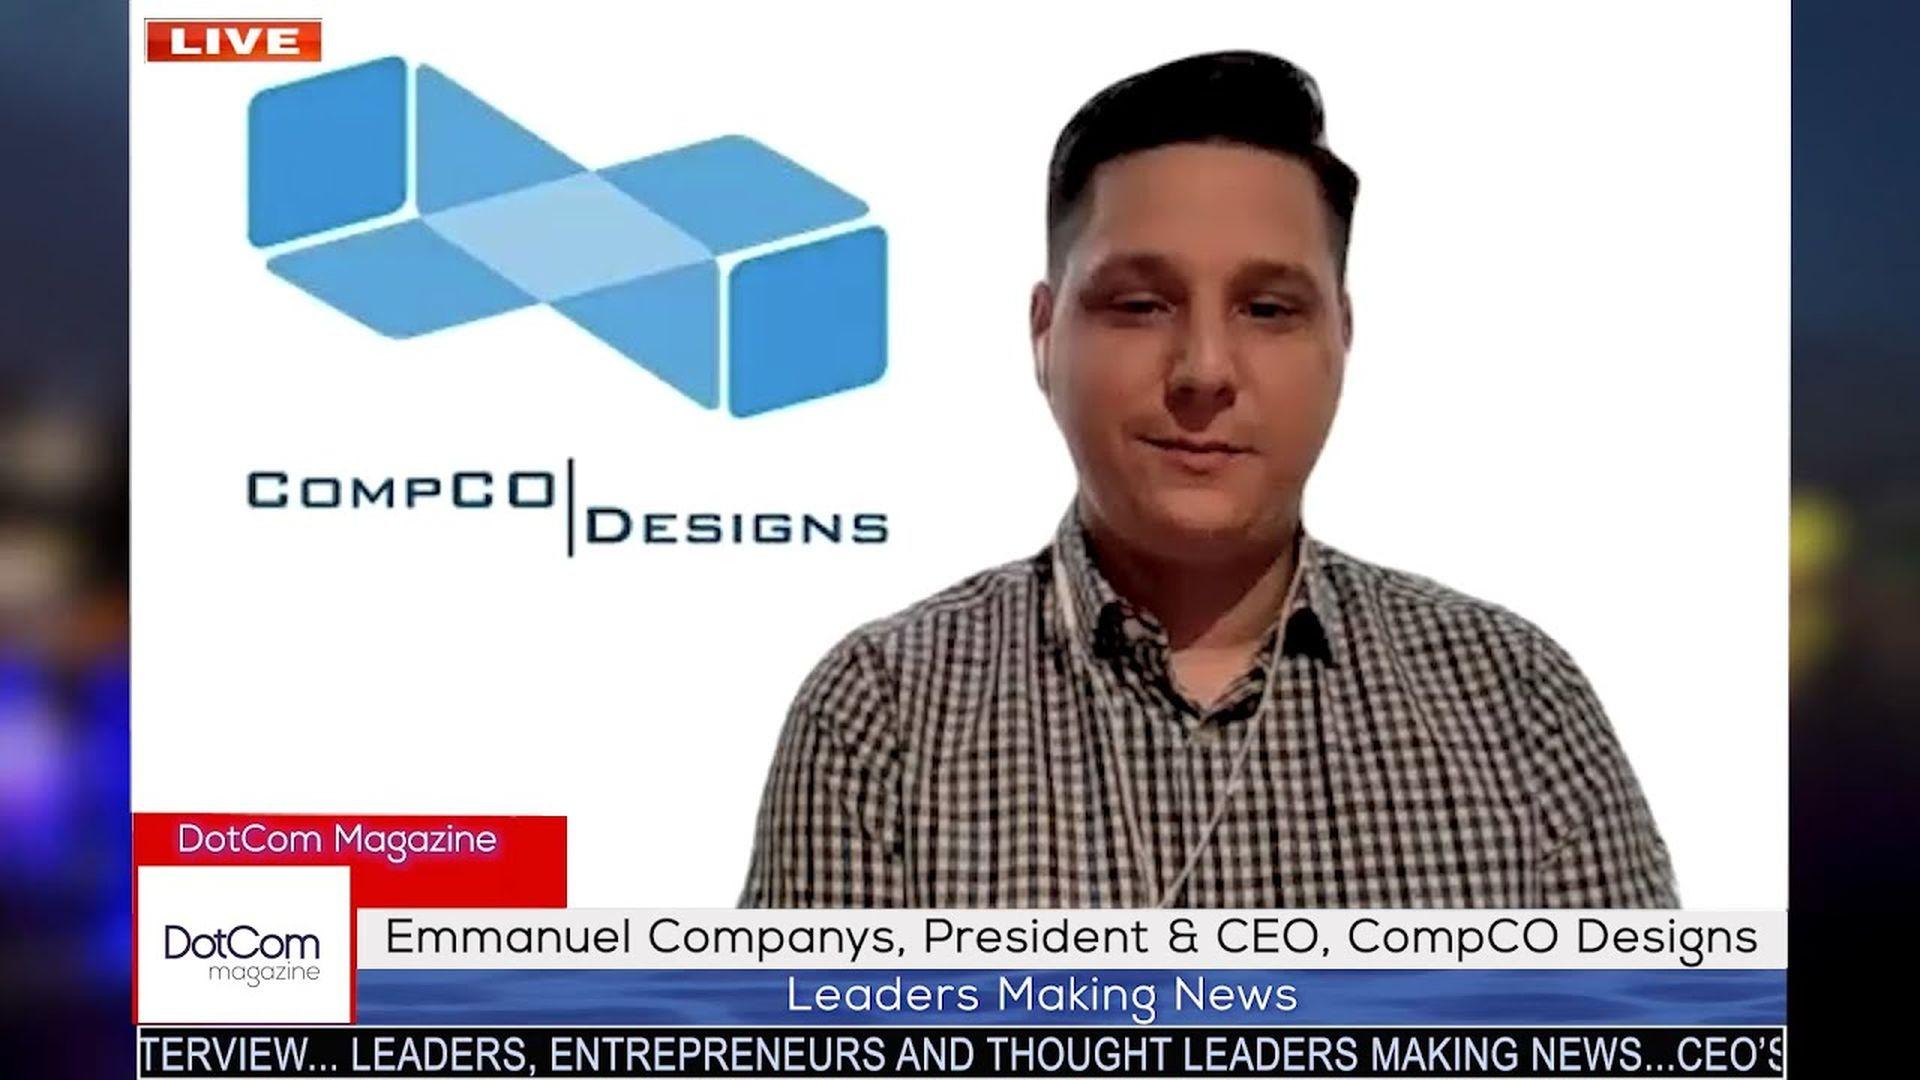 Emmanuel Companys, CEO, of CompCO Designs, A DotCom Magazine Exclusive Interview.